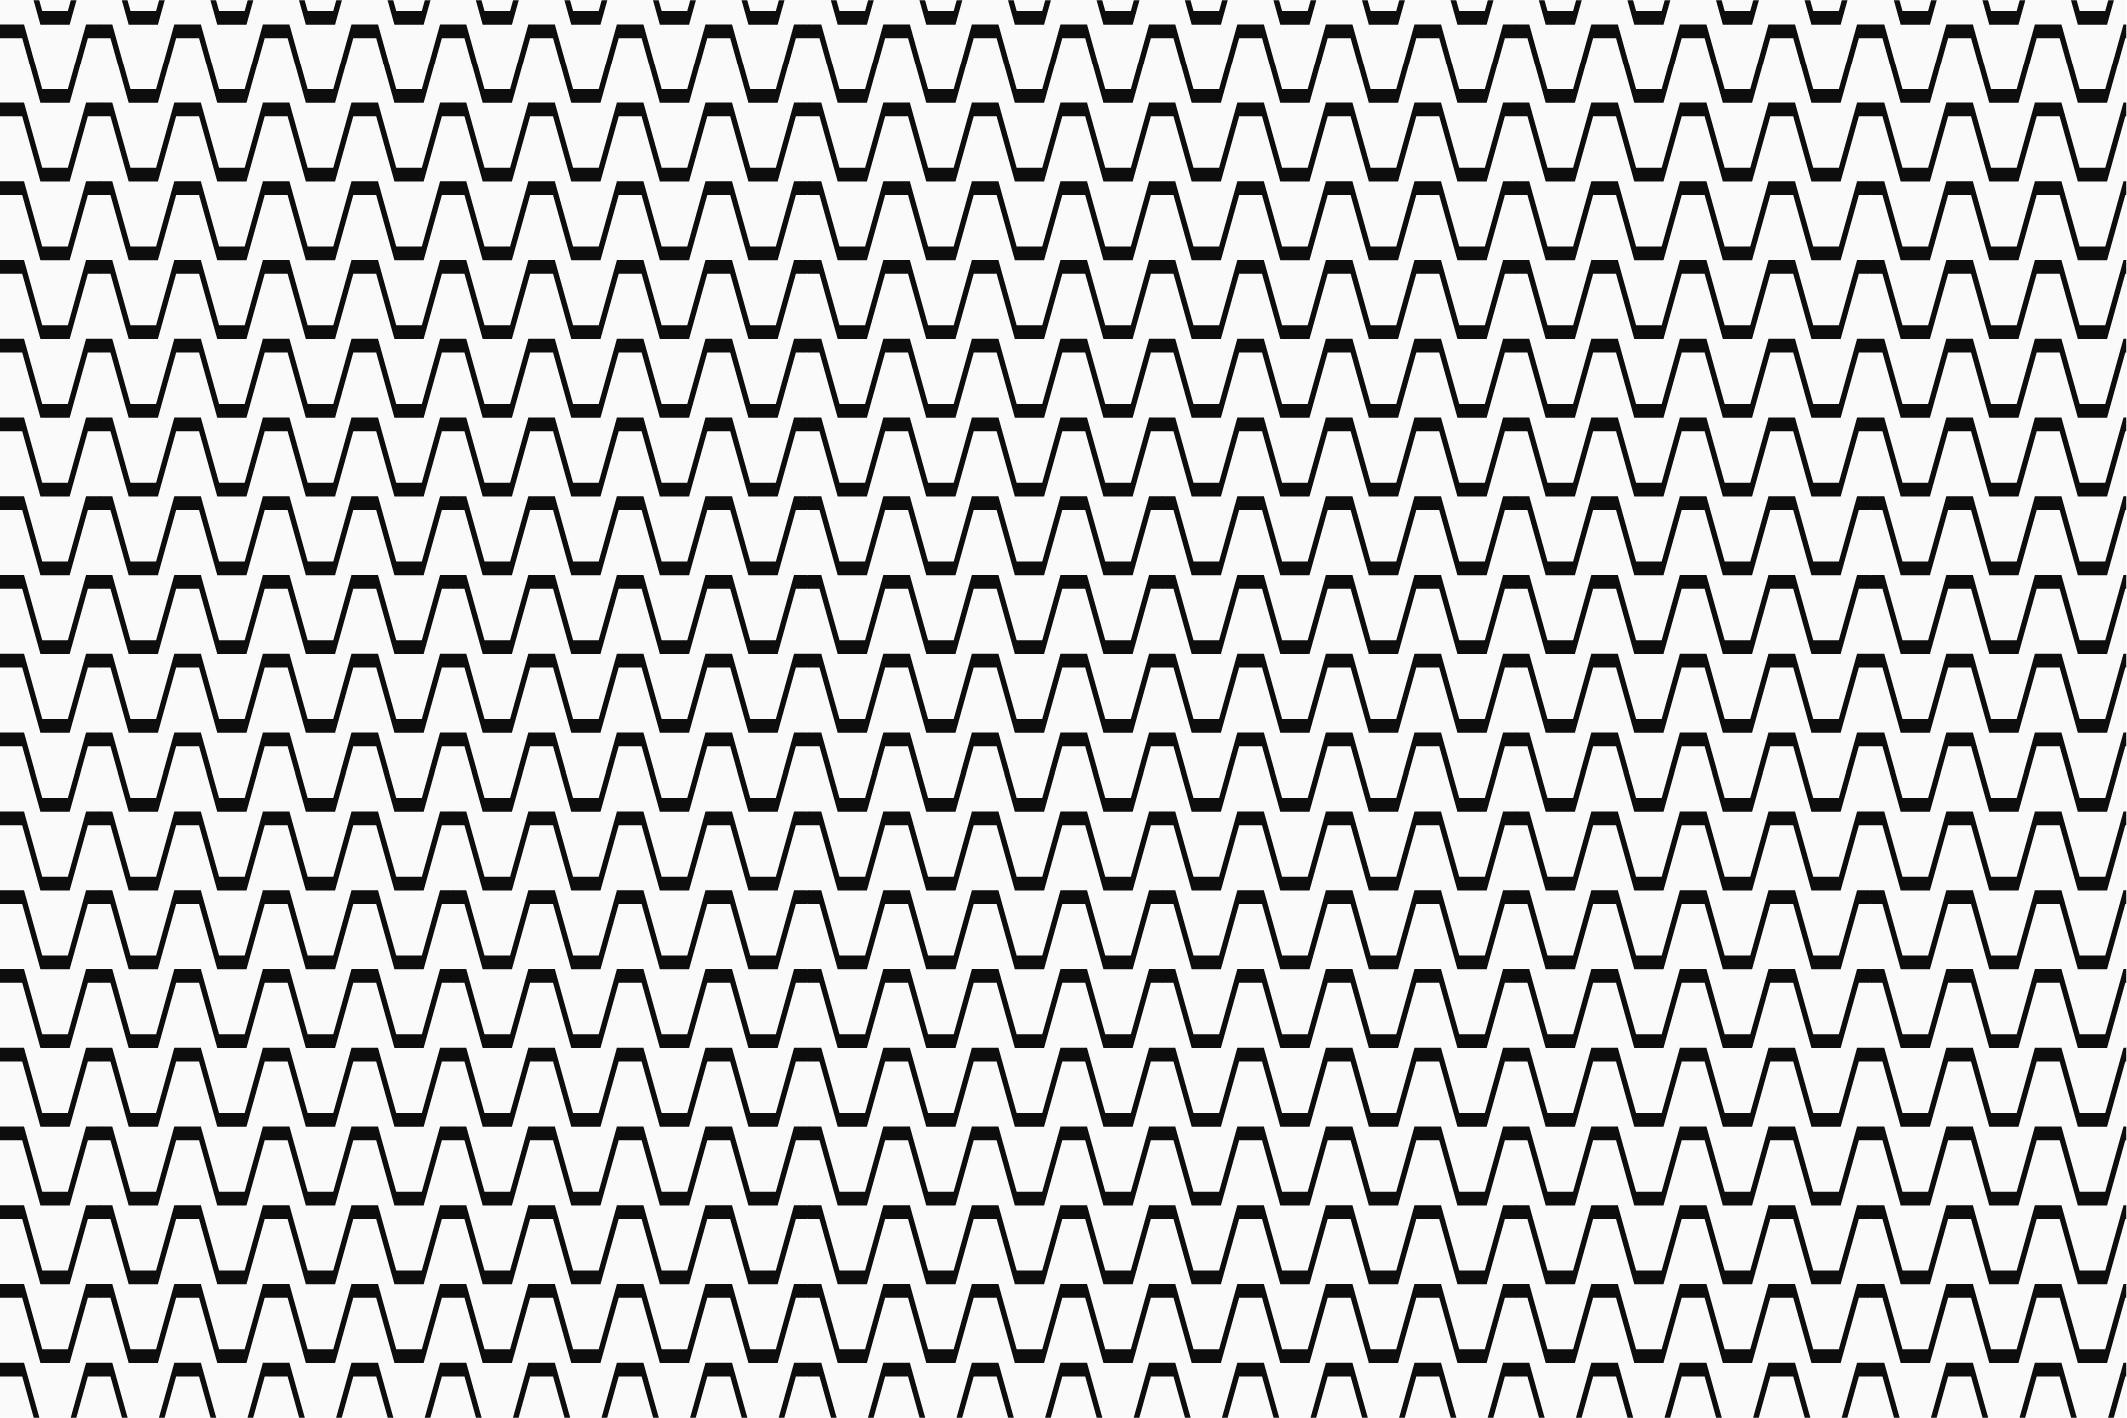 Wave&Zigzag seamless patterns. B&W. example image 9